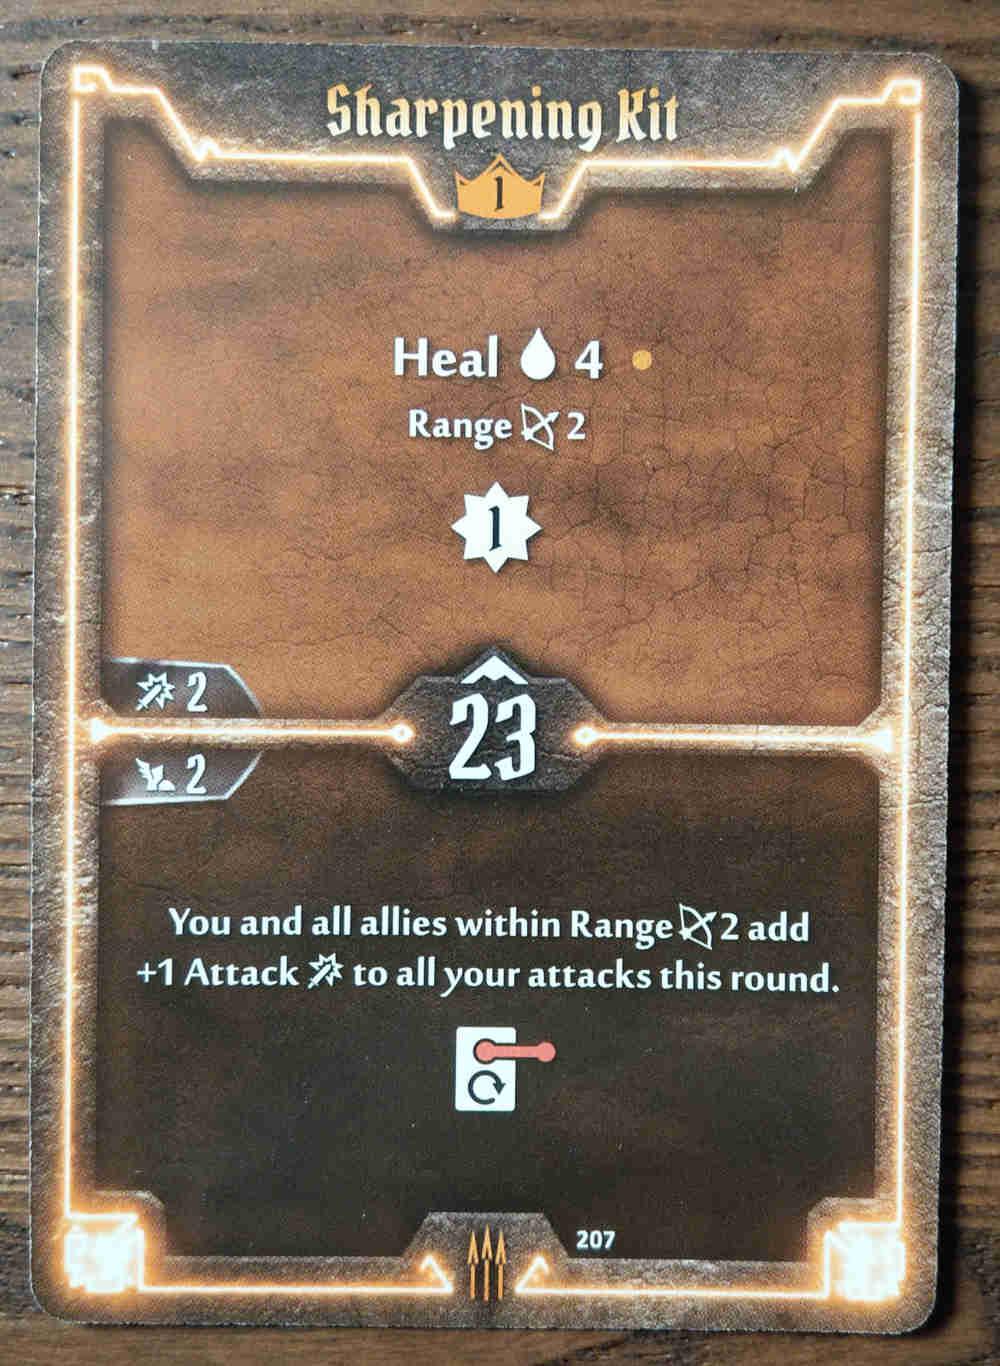 Level 1 Quartermaster card Sharpening Kit